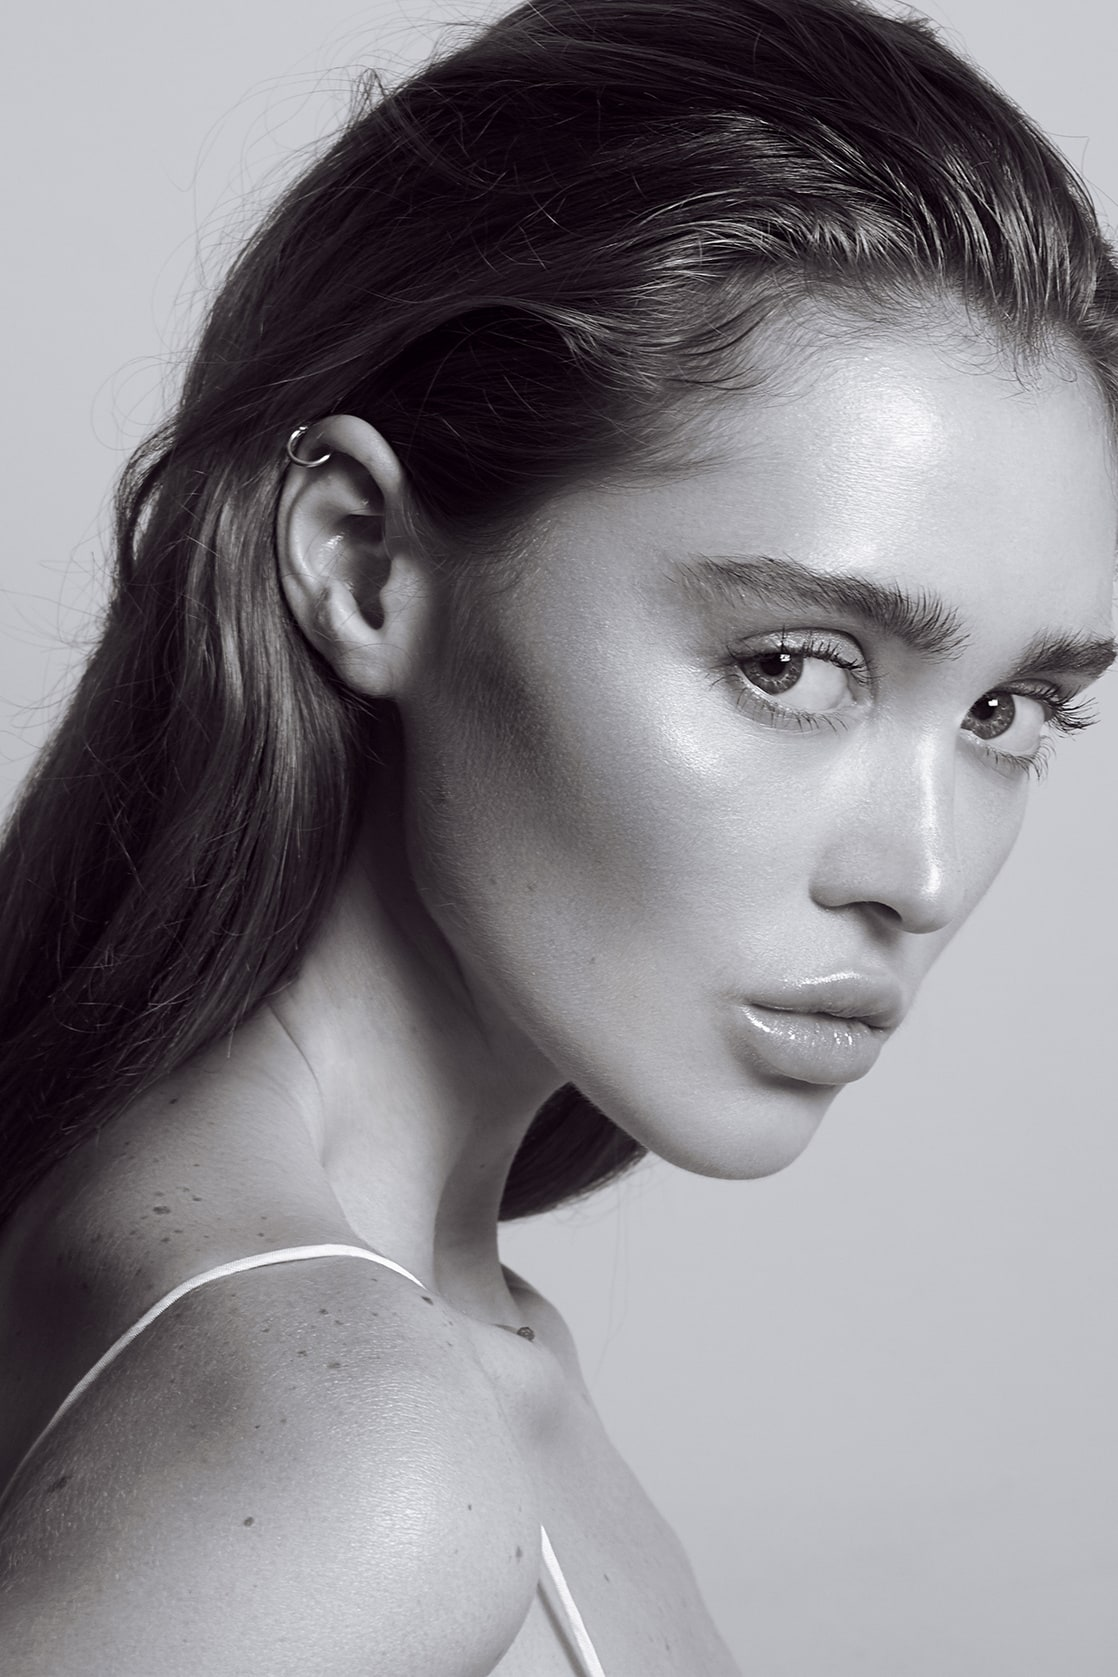 2019 Joanna Golabek nude photos 2019